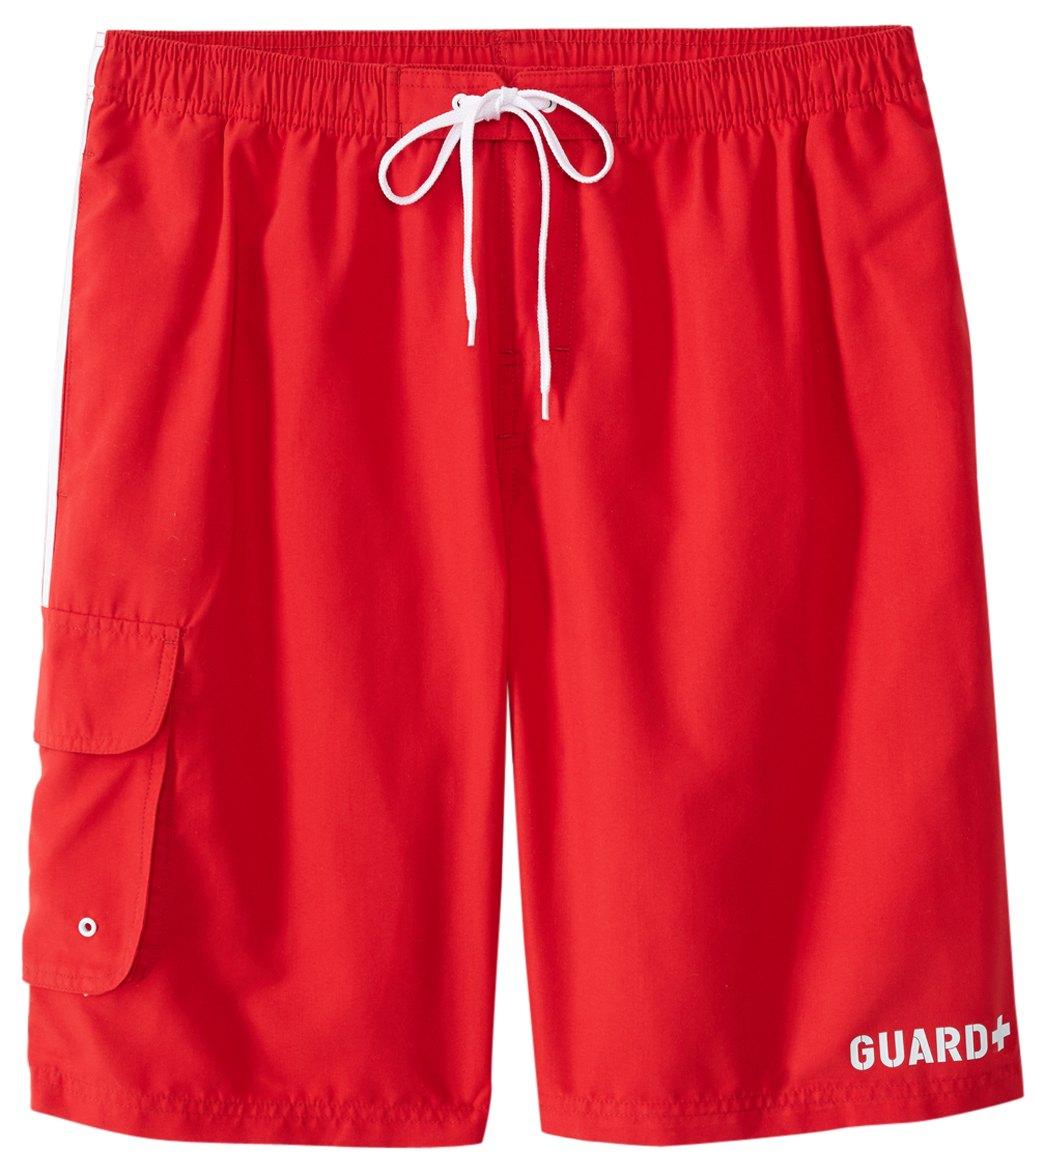 swimming shorts sporti guard menu0027s cargo swim trunk at swimoutlet.com rwwaydg